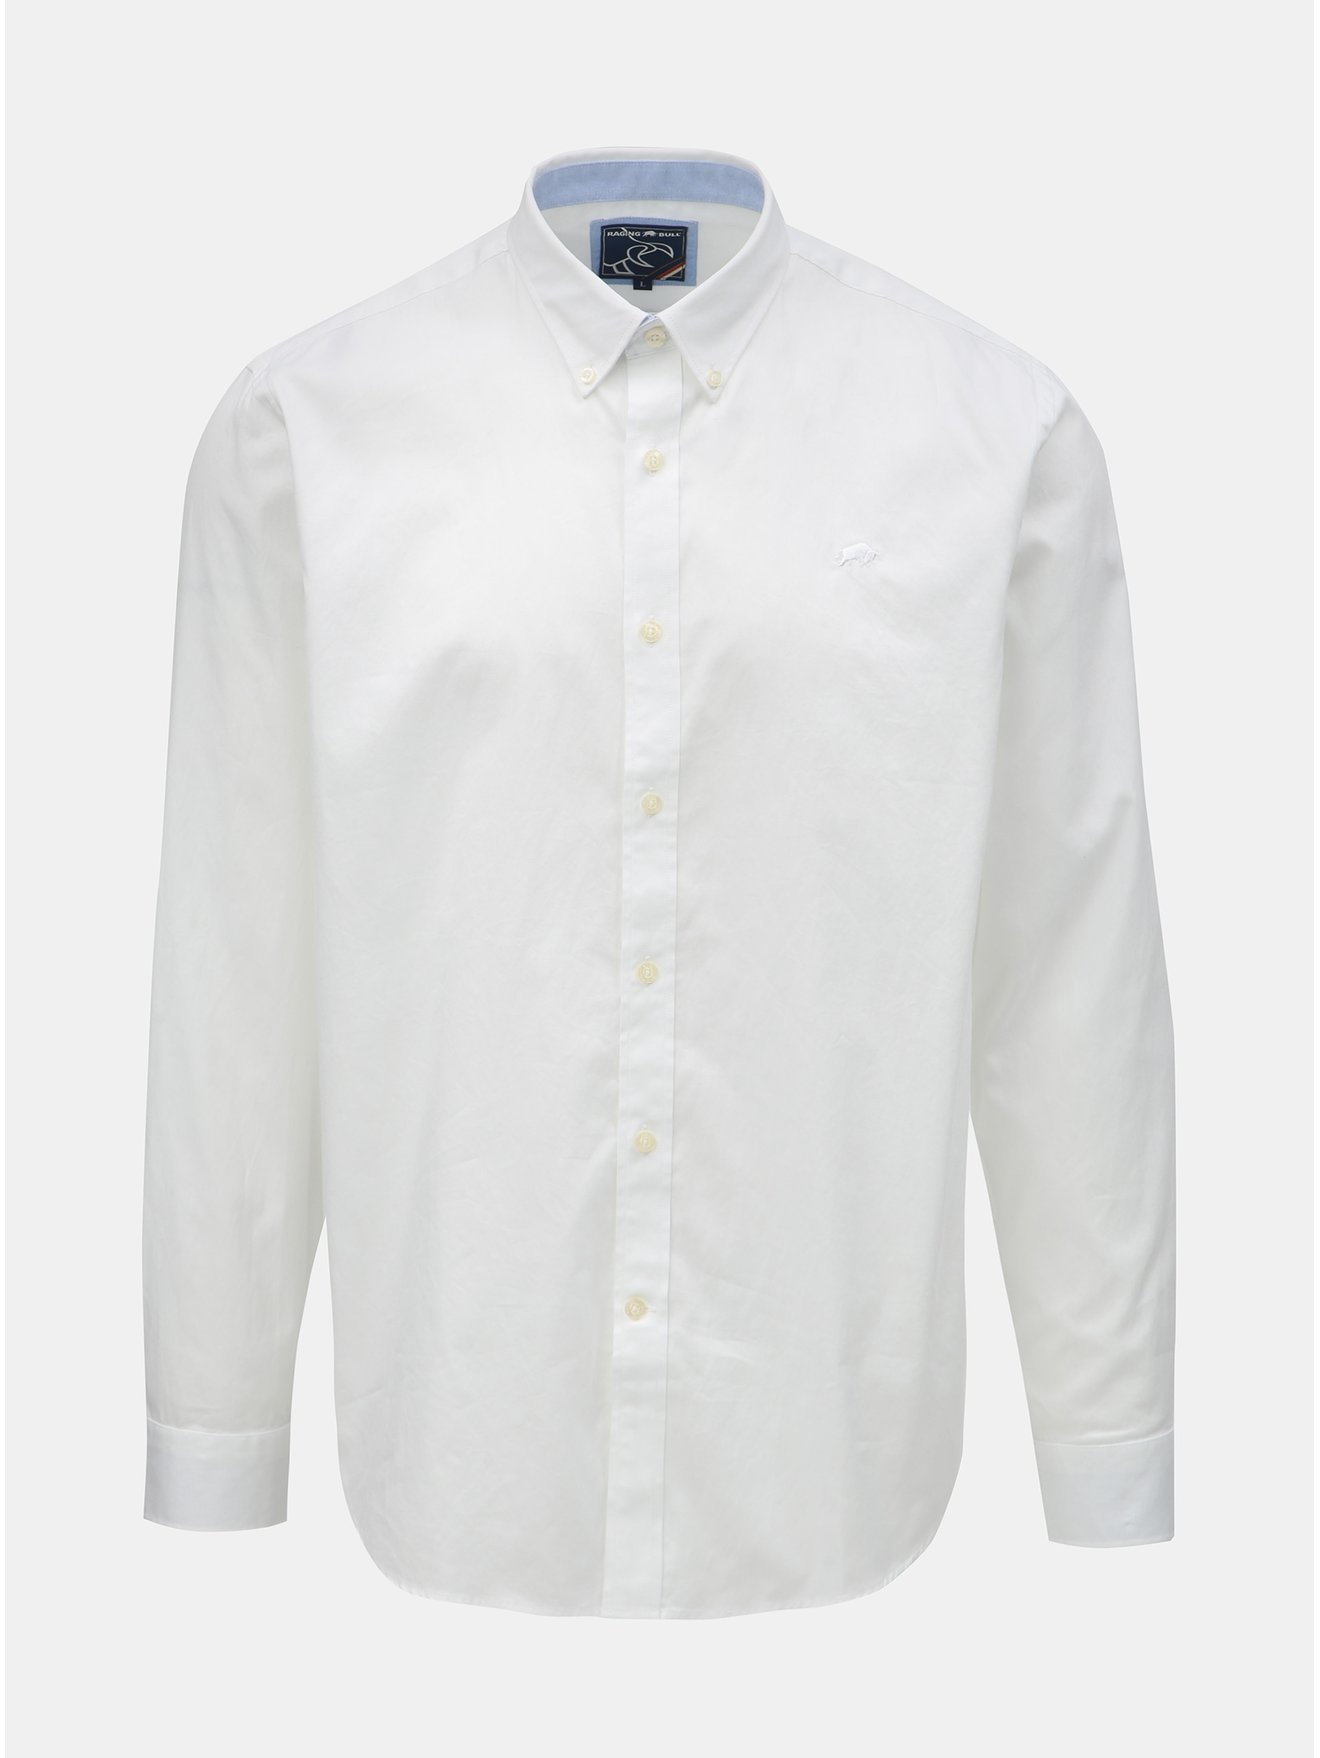 Bílá košile s dlouhým rukávem Raging Bull 8bf7b13b26